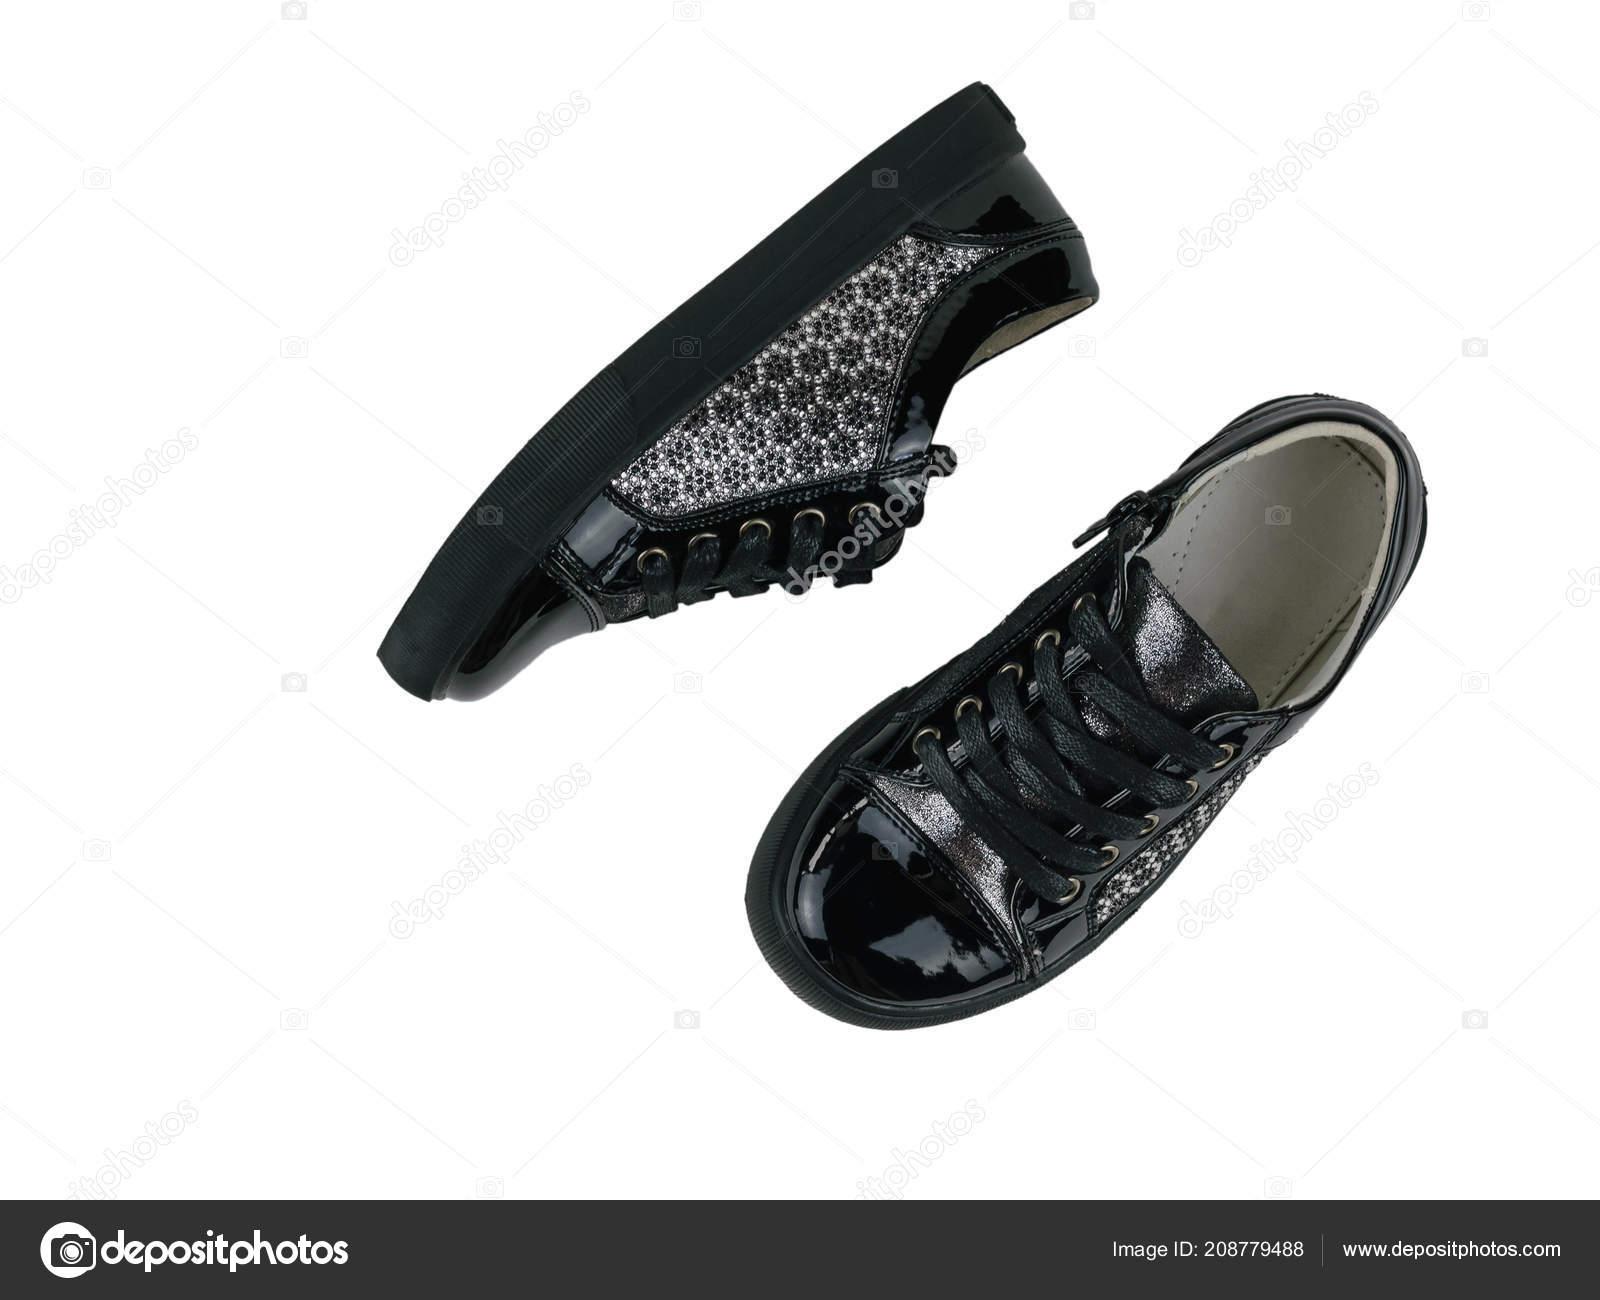 5b56f71f175 Ζευγάρι μαύρα παιδιά αθλητικά παπούτσια ύφους που απομονώνονται σε λευκό  φόντο. Παιδικά Αθλητικά παπούτσια. Επίπεδη θέσει — Εικόνα από ...